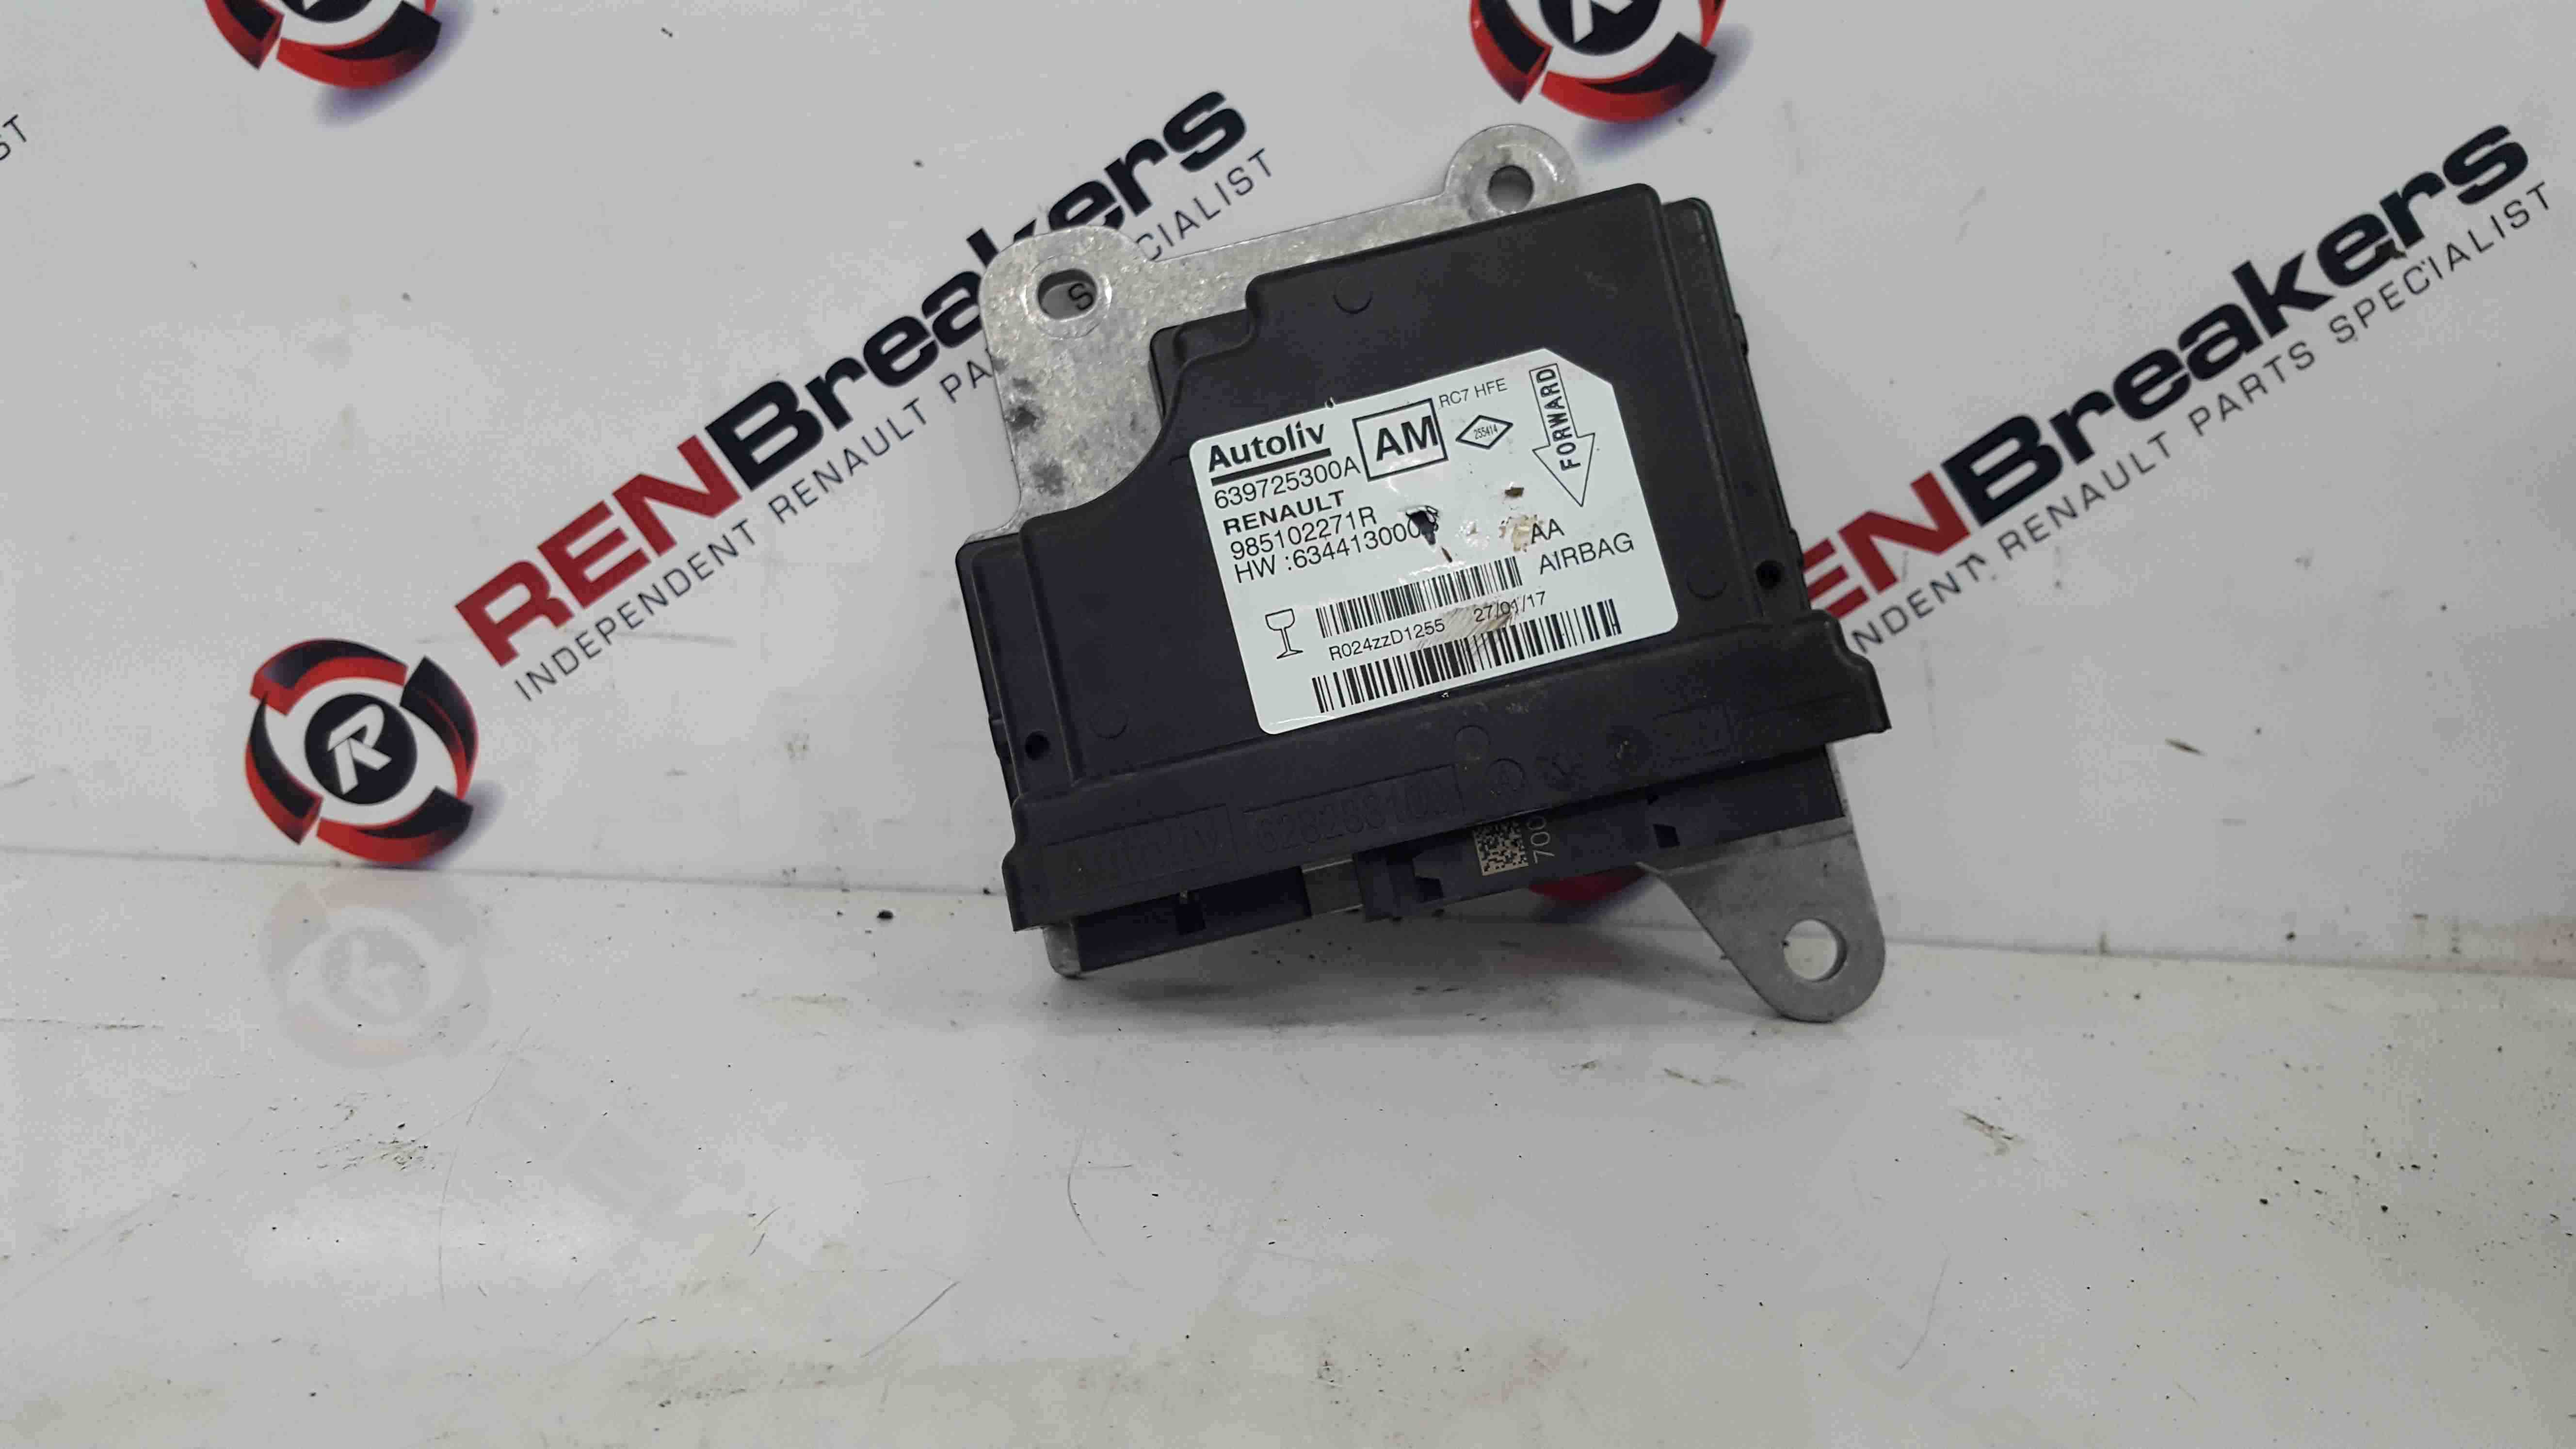 Renault Kadjar 2015-2021 Airbag Module Computer Spares And Repairs 985102271R